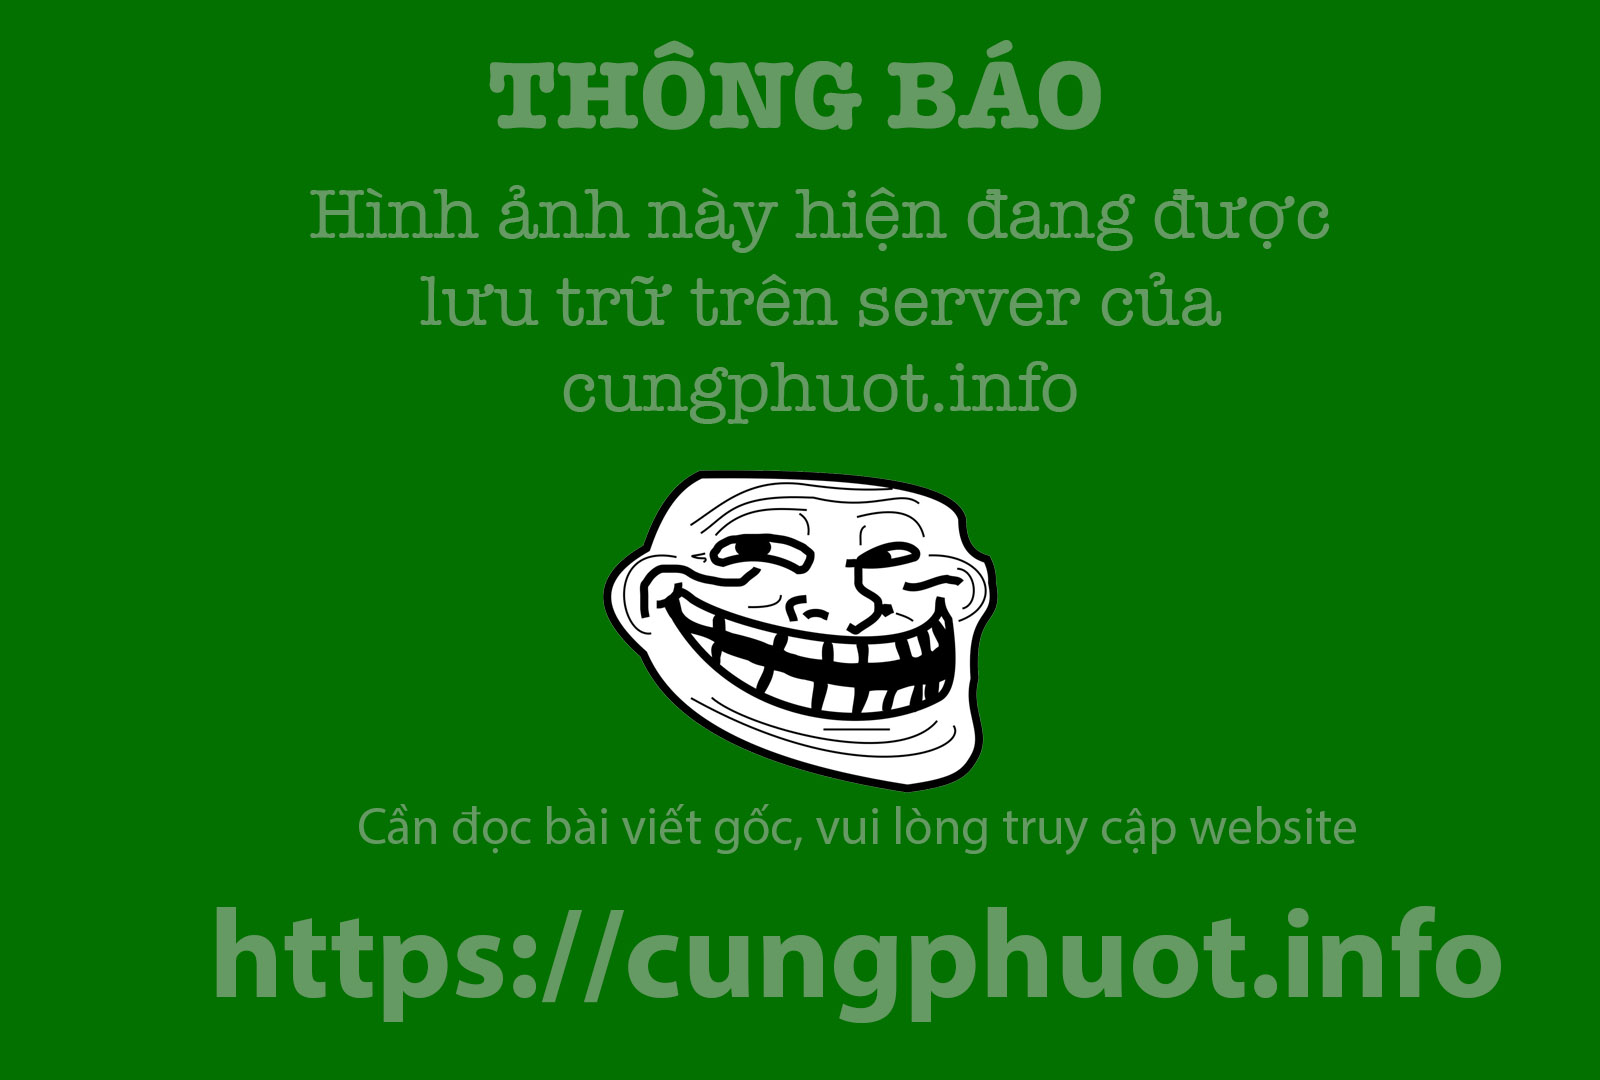 Vuon hoa tam giac mach o Ninh Binh hinh anh 9